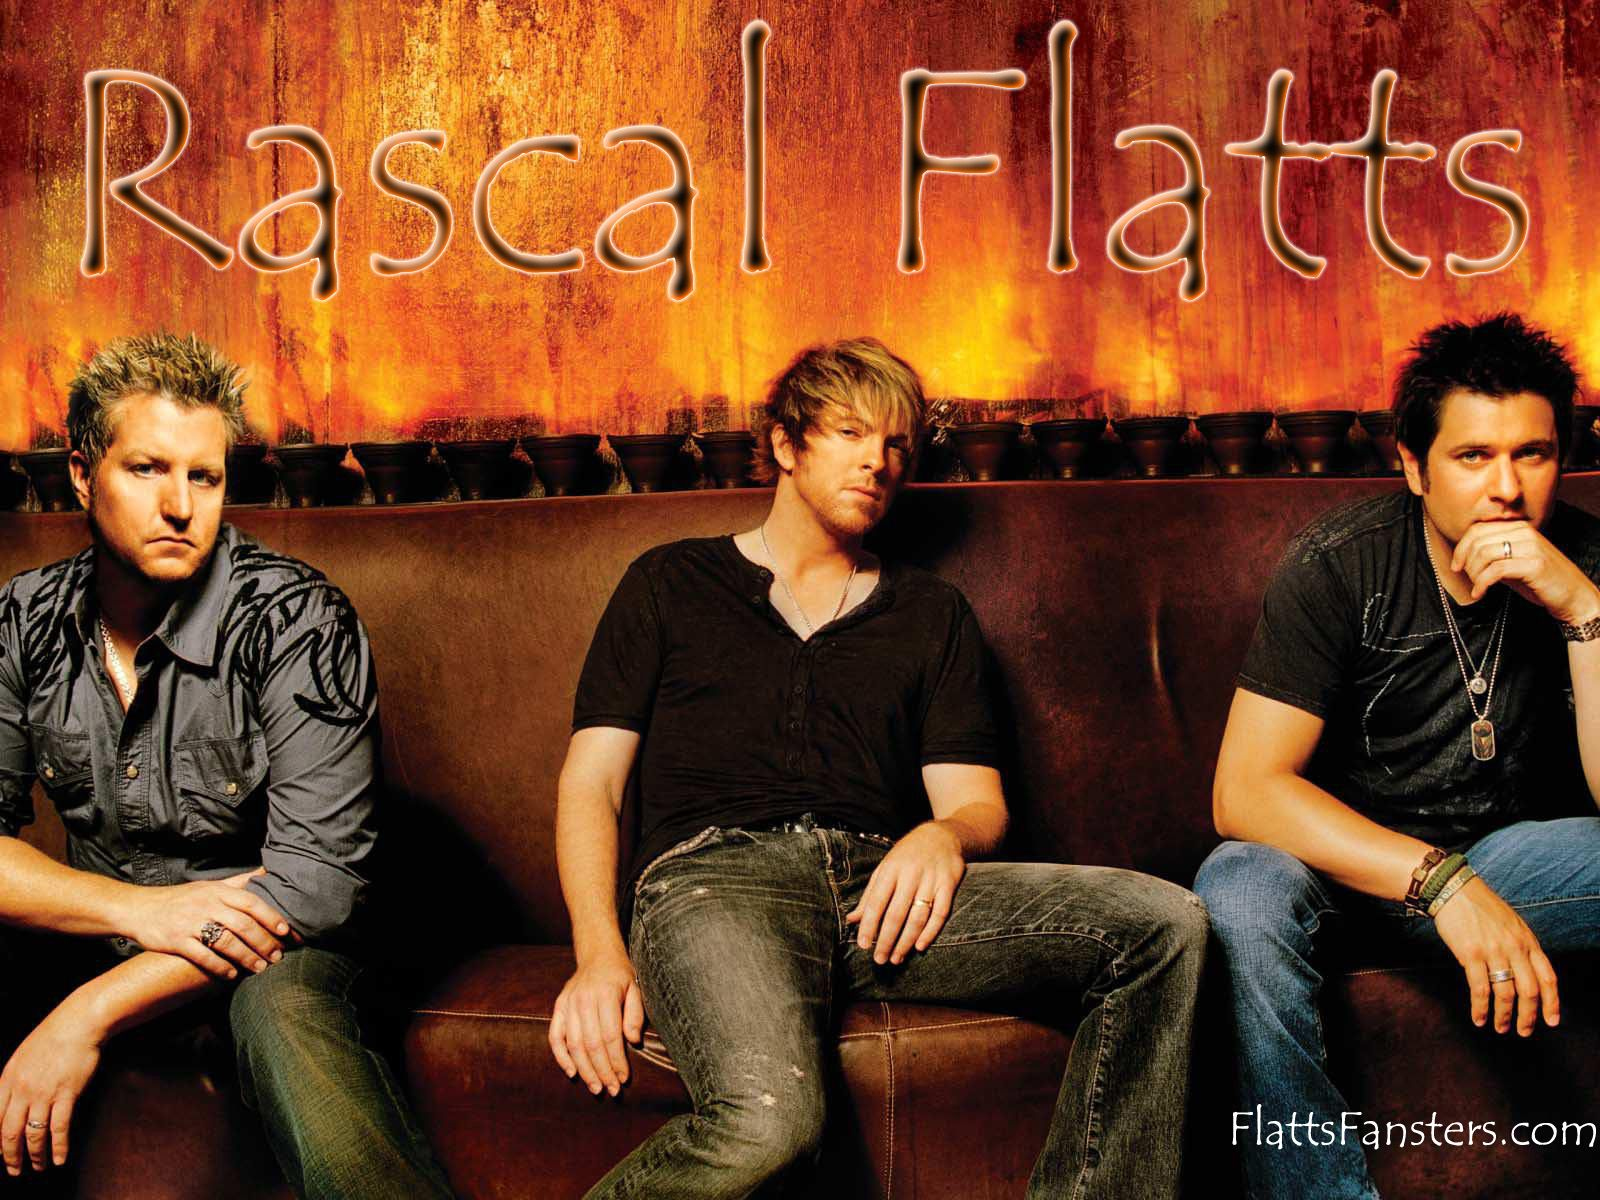 Rascal Flatts. | Music | Piano Sheet Music, Rascal flatts ...